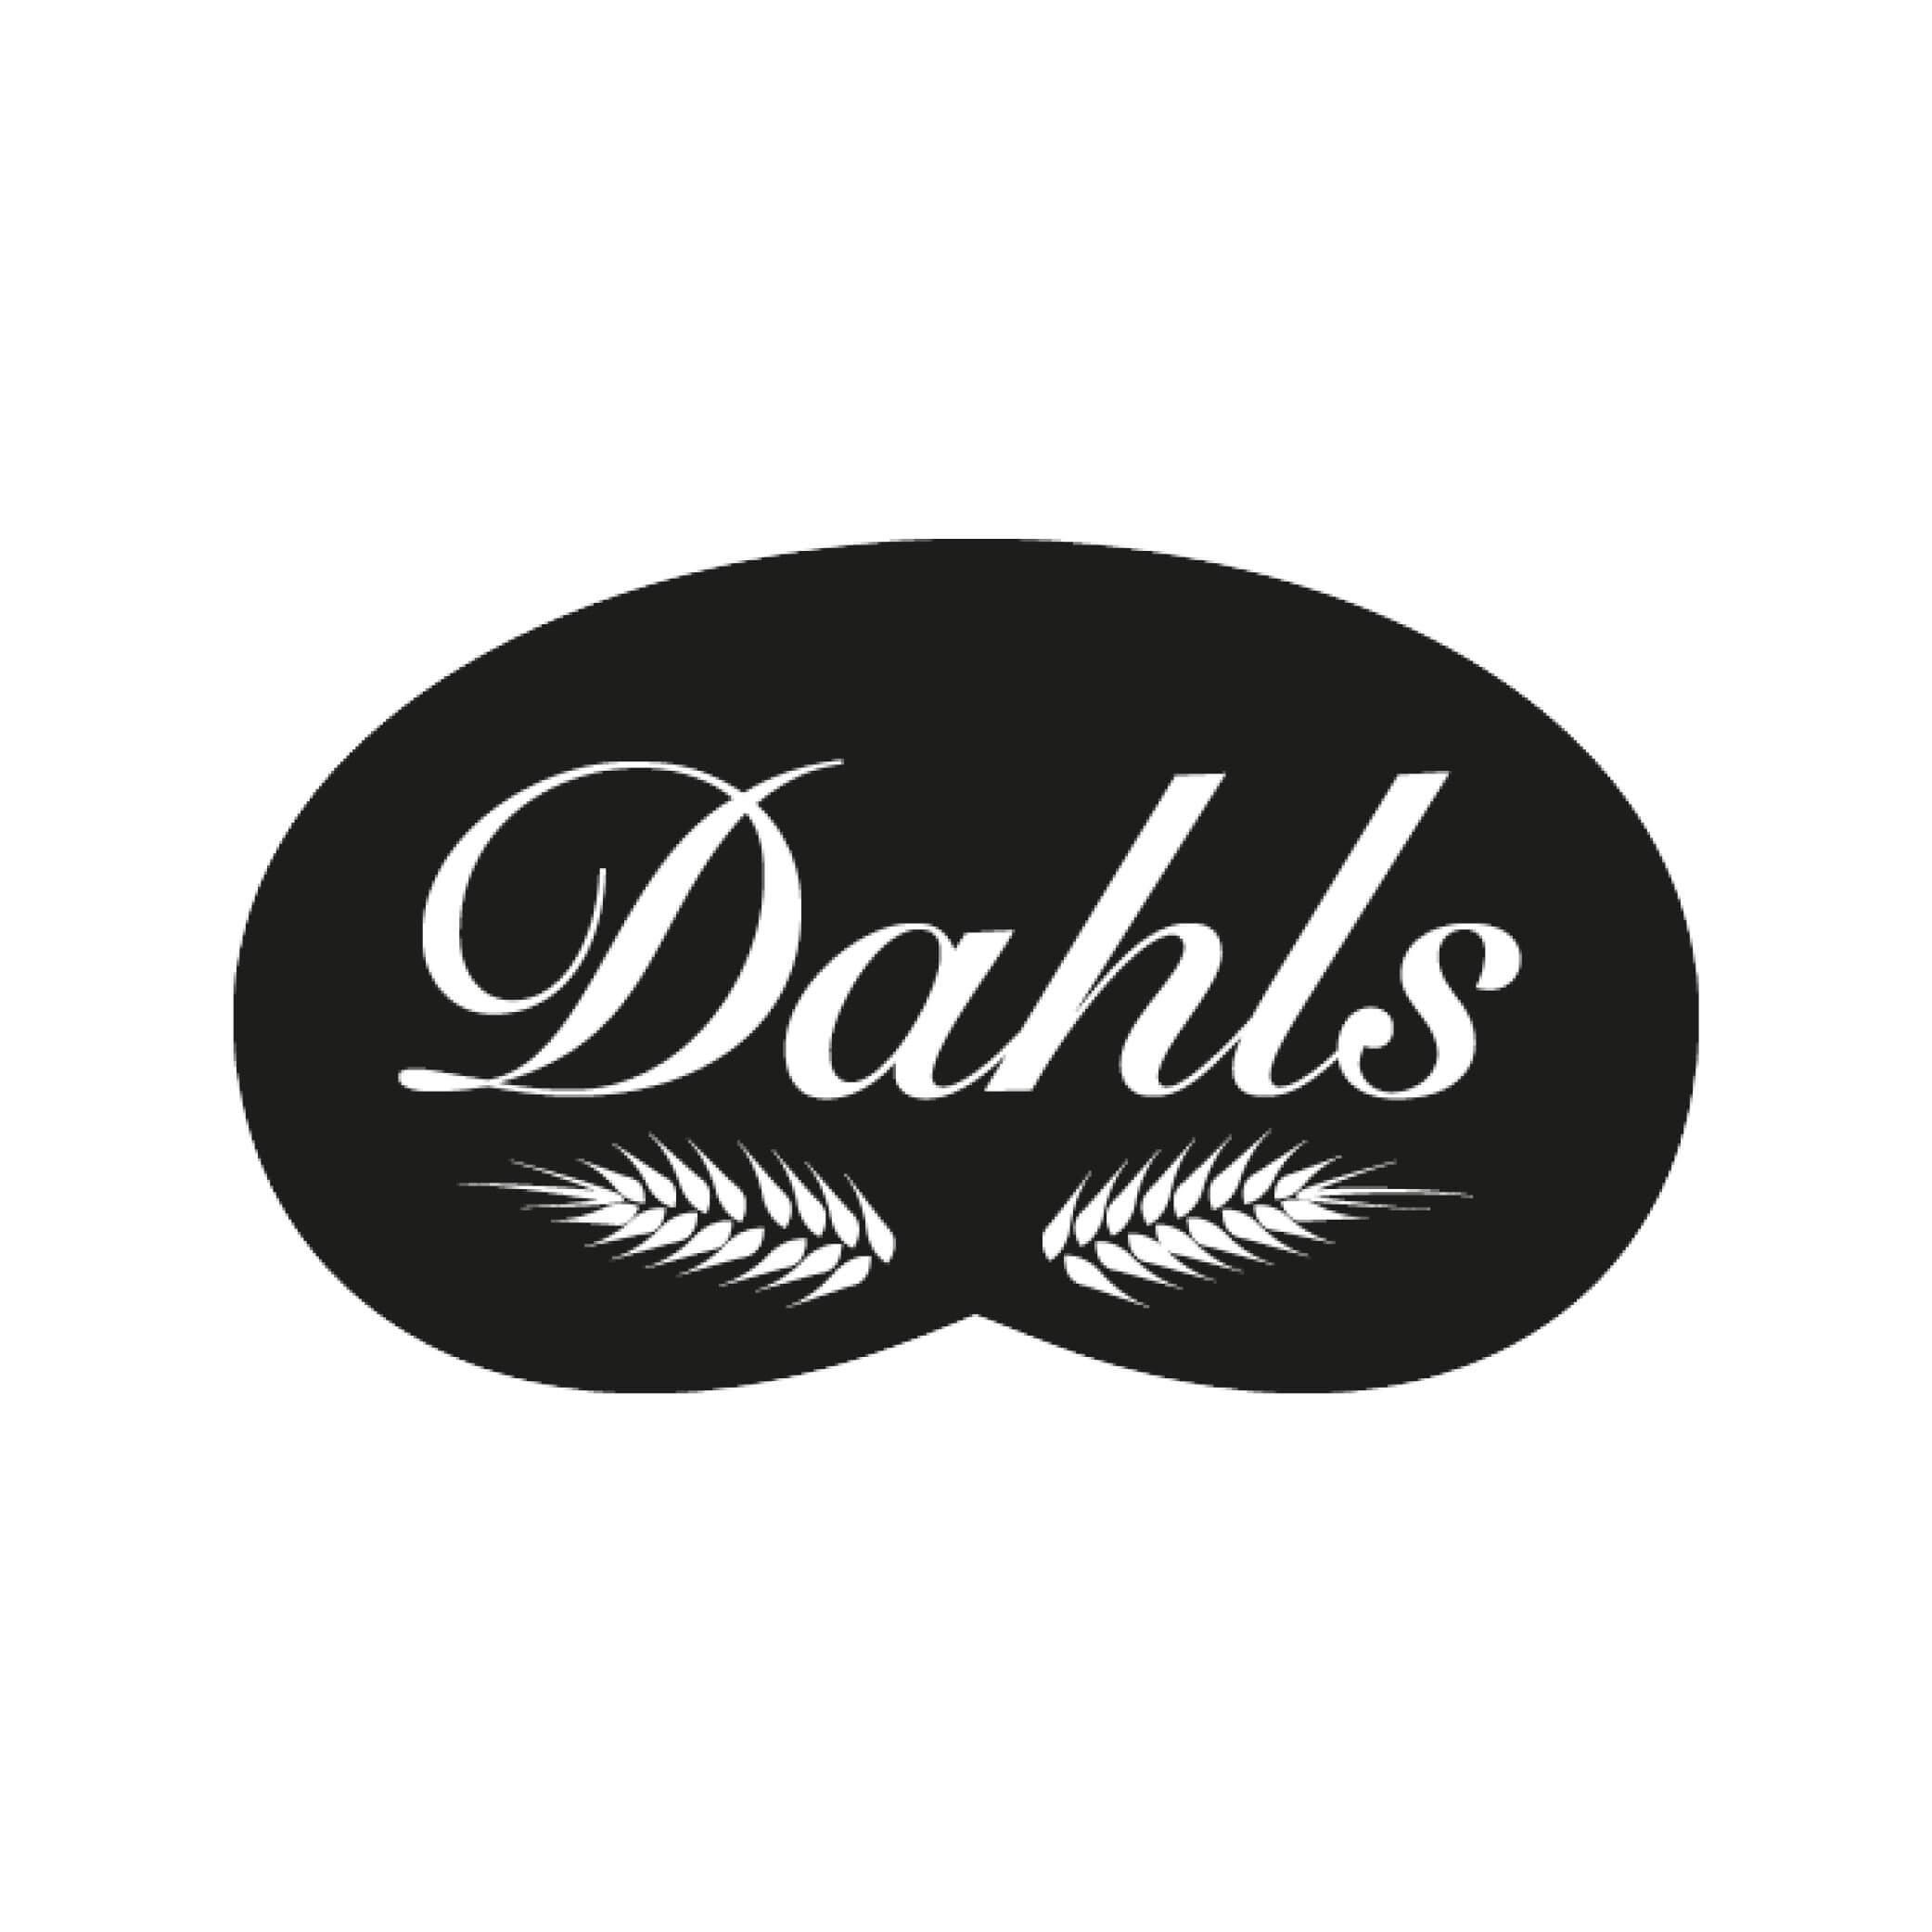 Dahls - Referenser